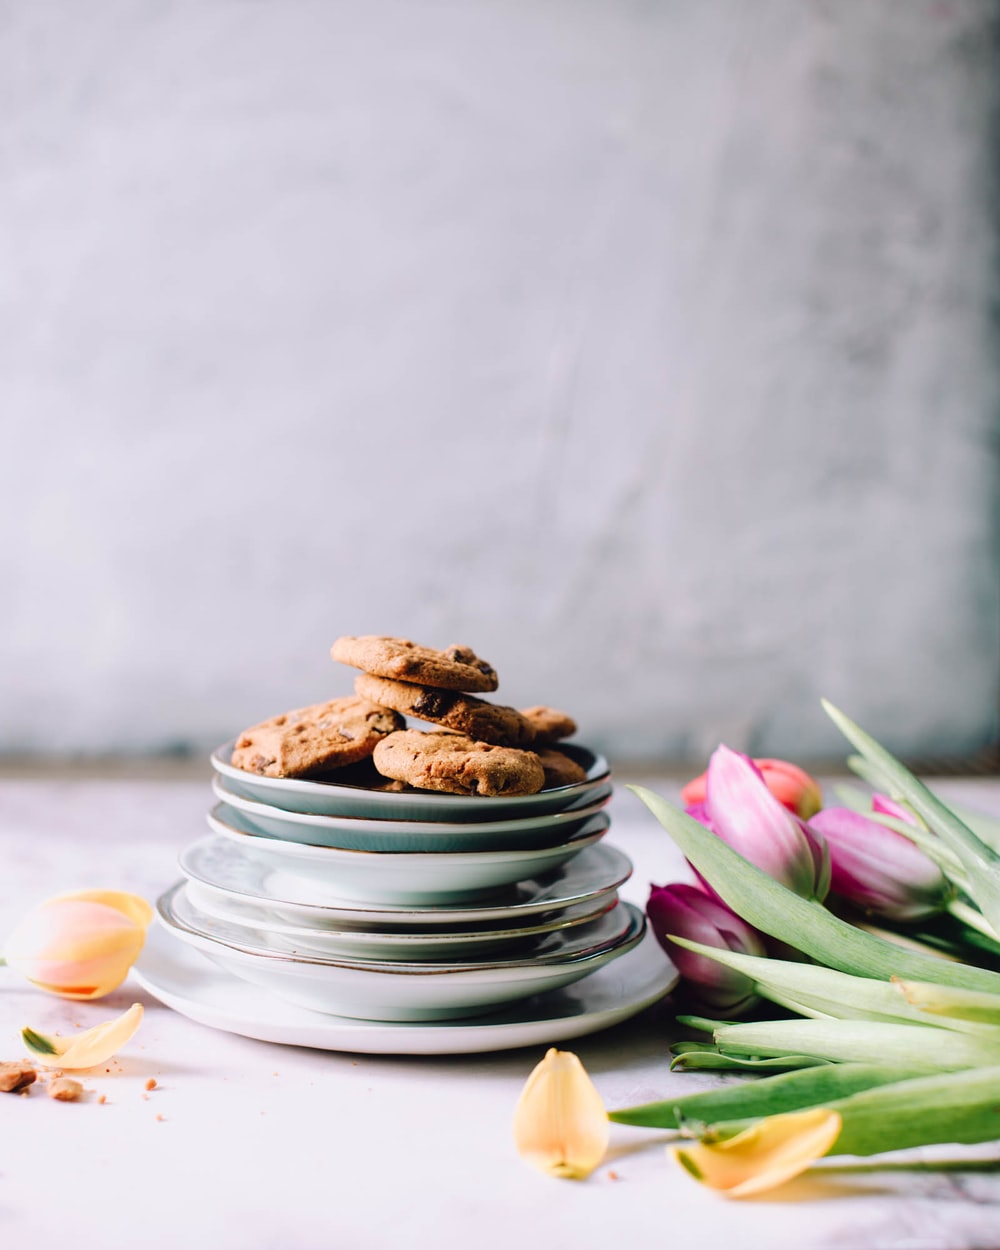 JENNIFER PALLIAN (@foodess) • Instagram photos and videos